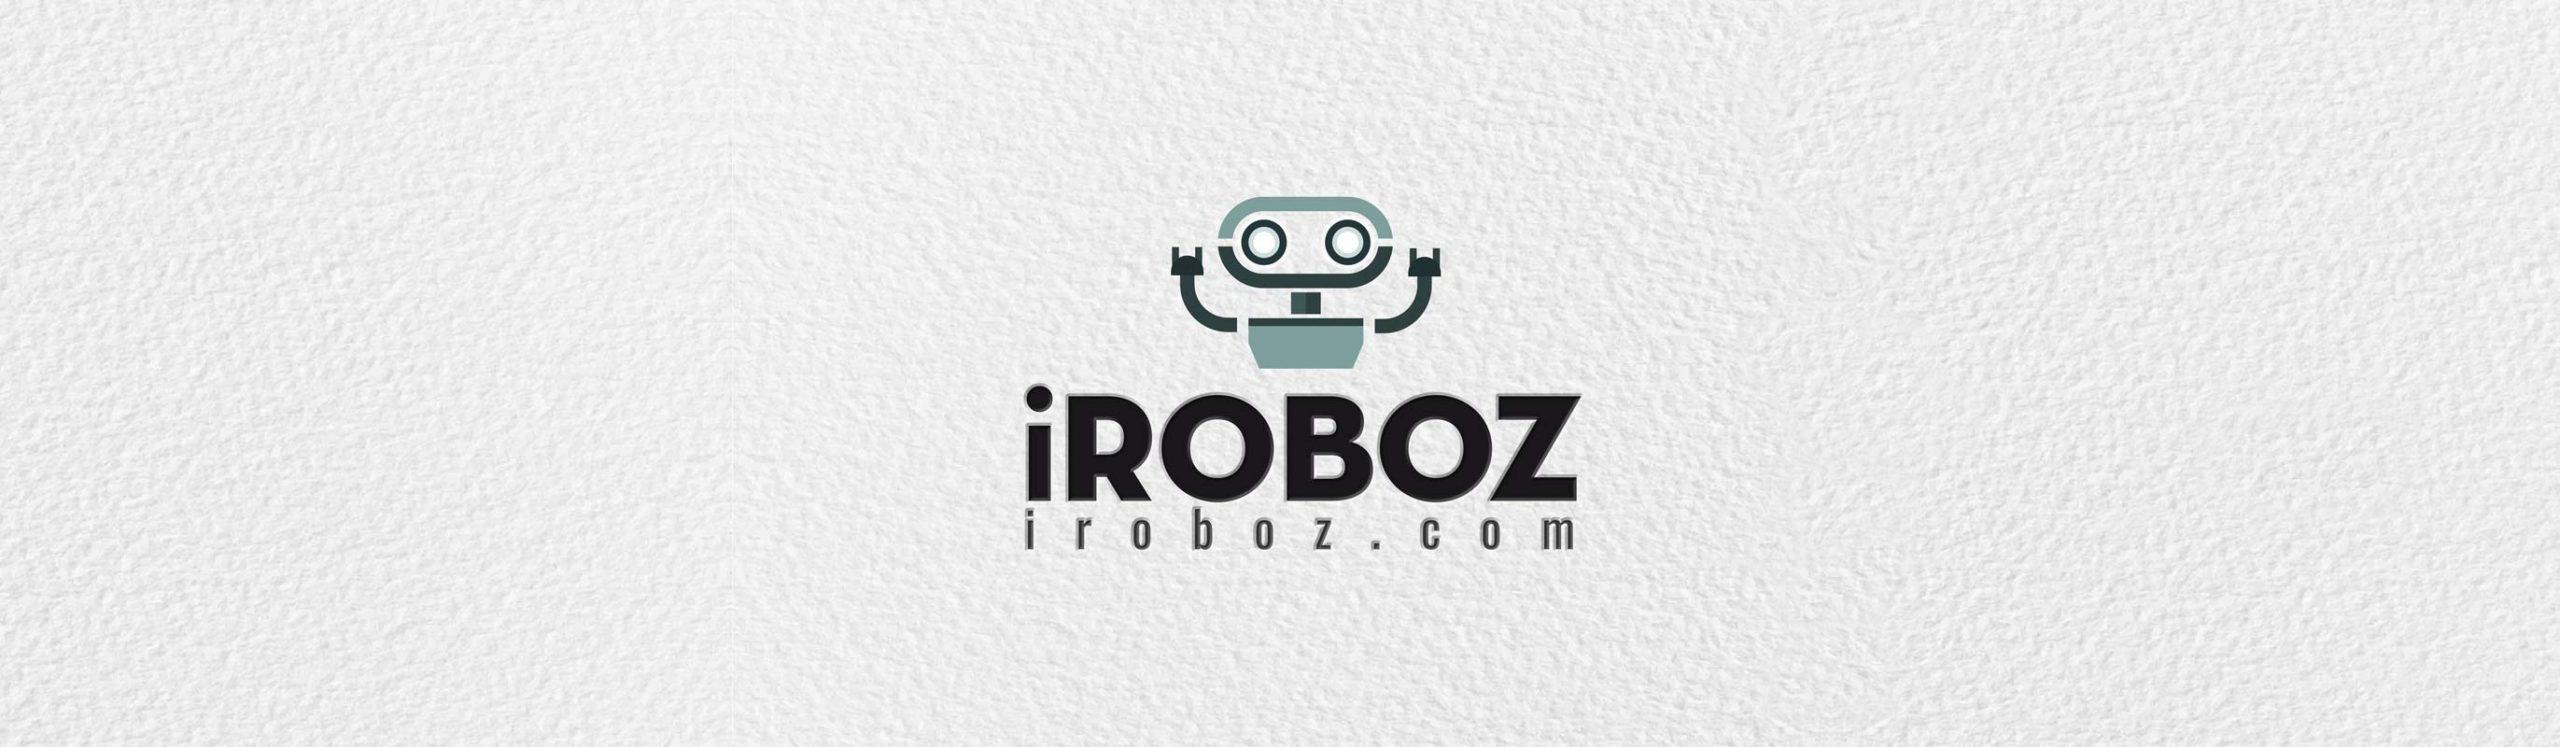 iroboz Branding design